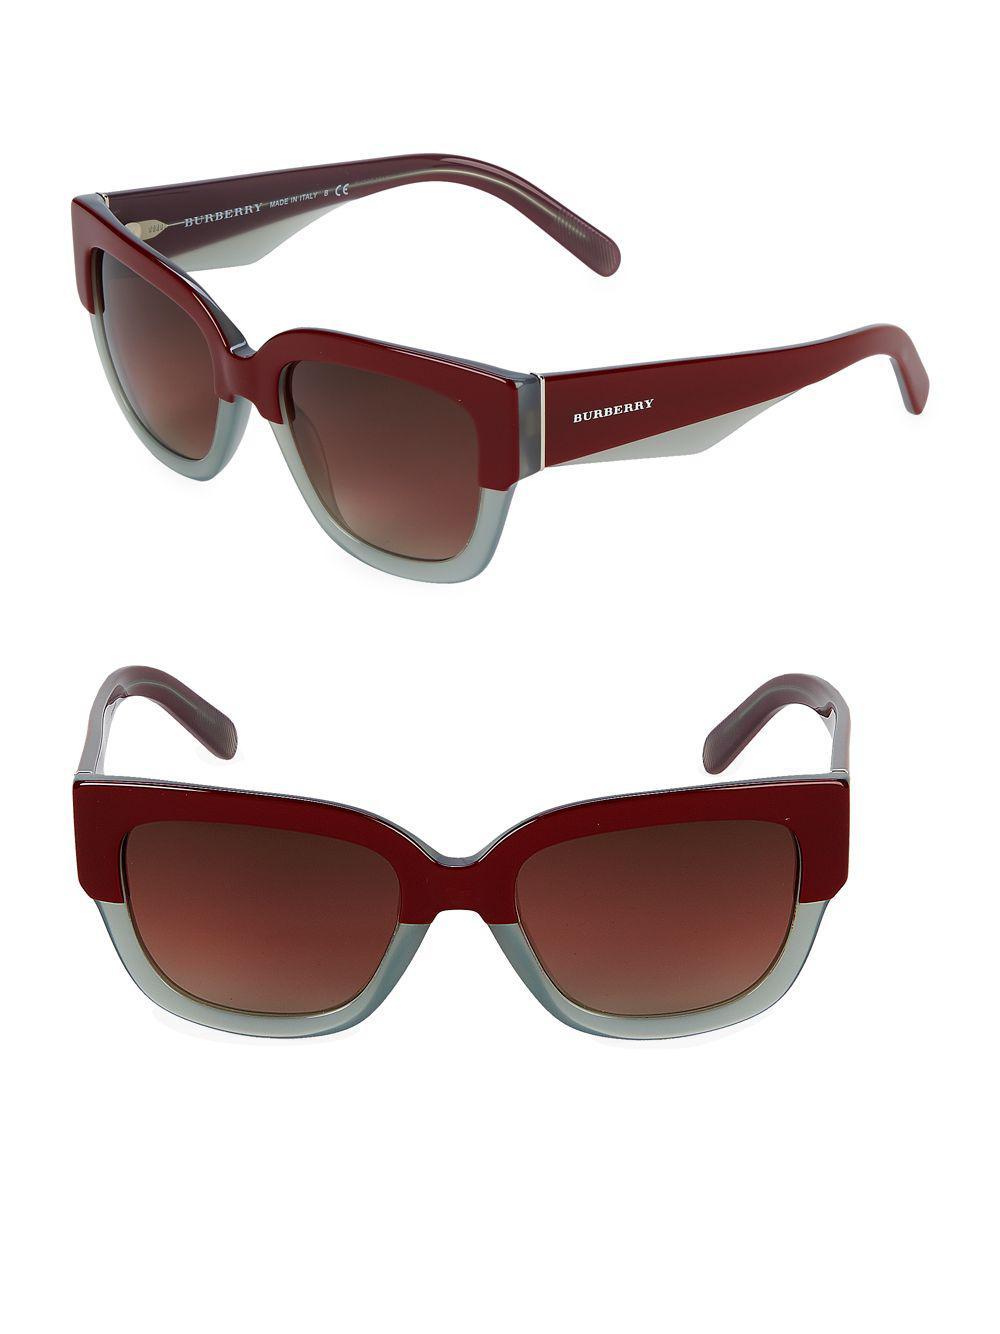 410bc7a94f4c2 Burberry - Red 53mm Square Sunglasses - Lyst. View fullscreen